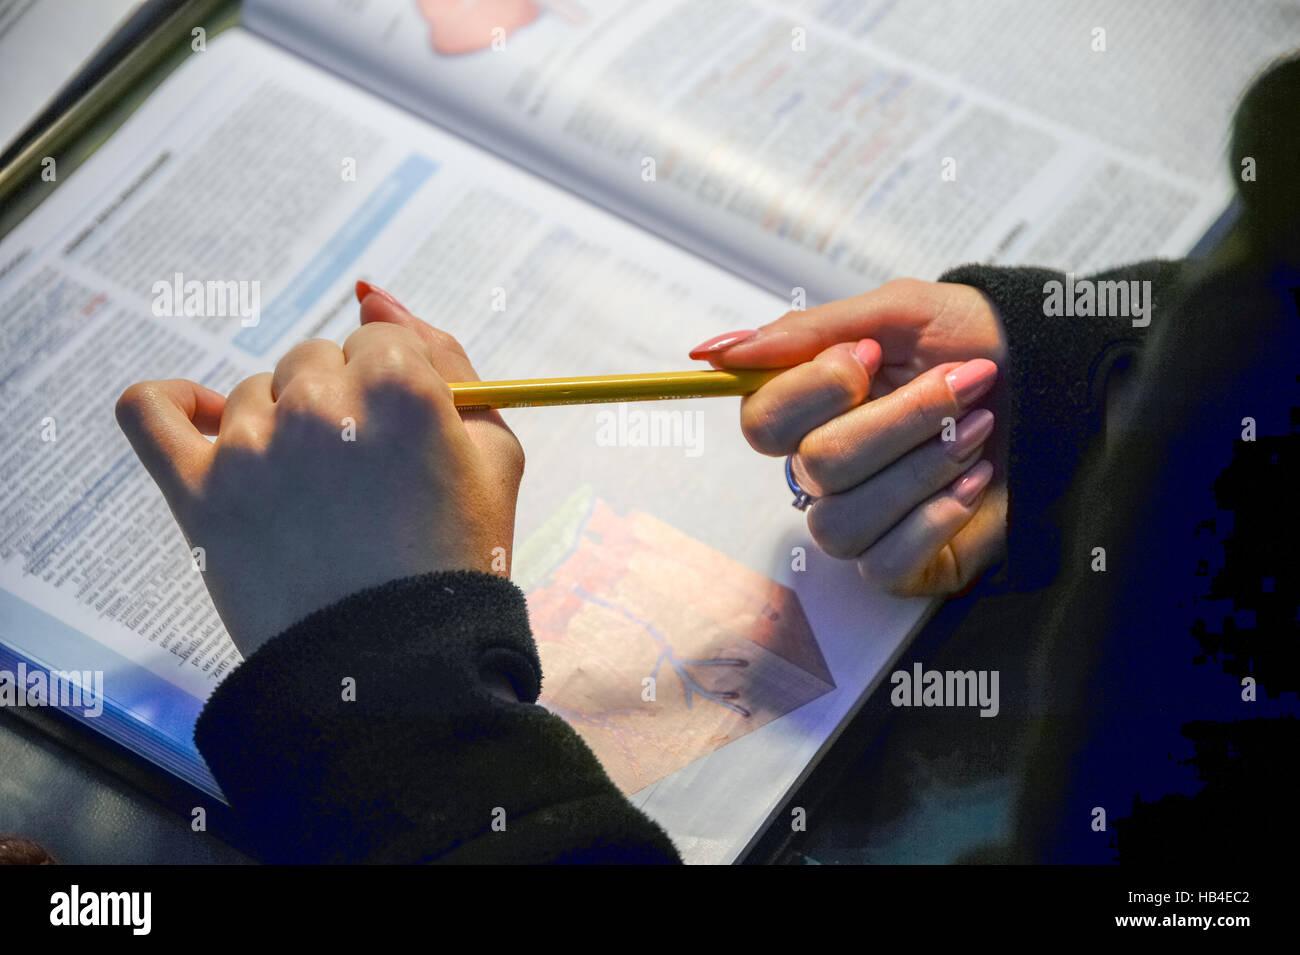 Hands  studying anatomy - Stock Image